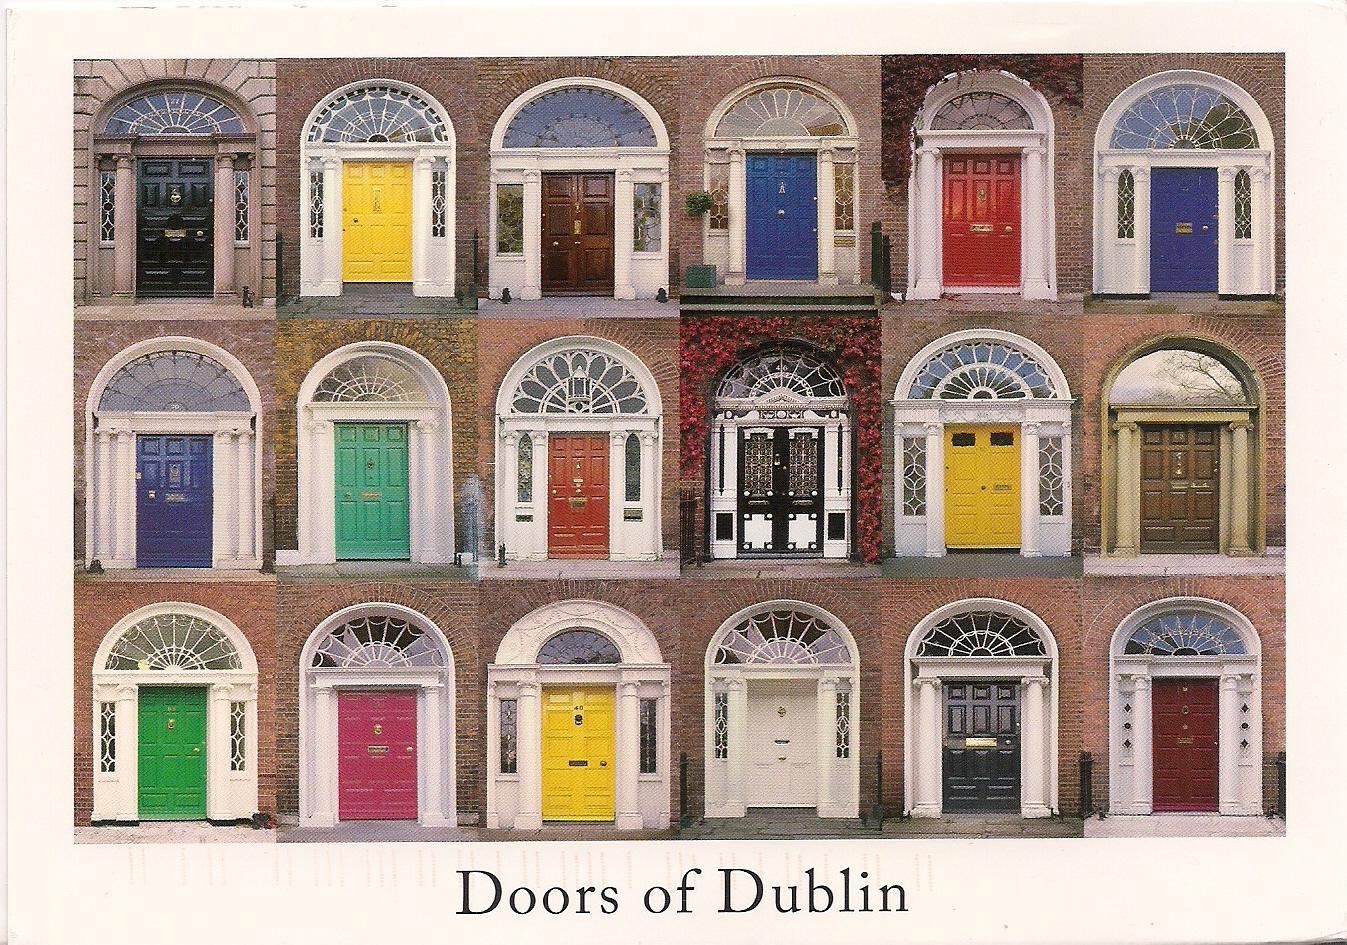 postcards2lufra: Doors of Dublin